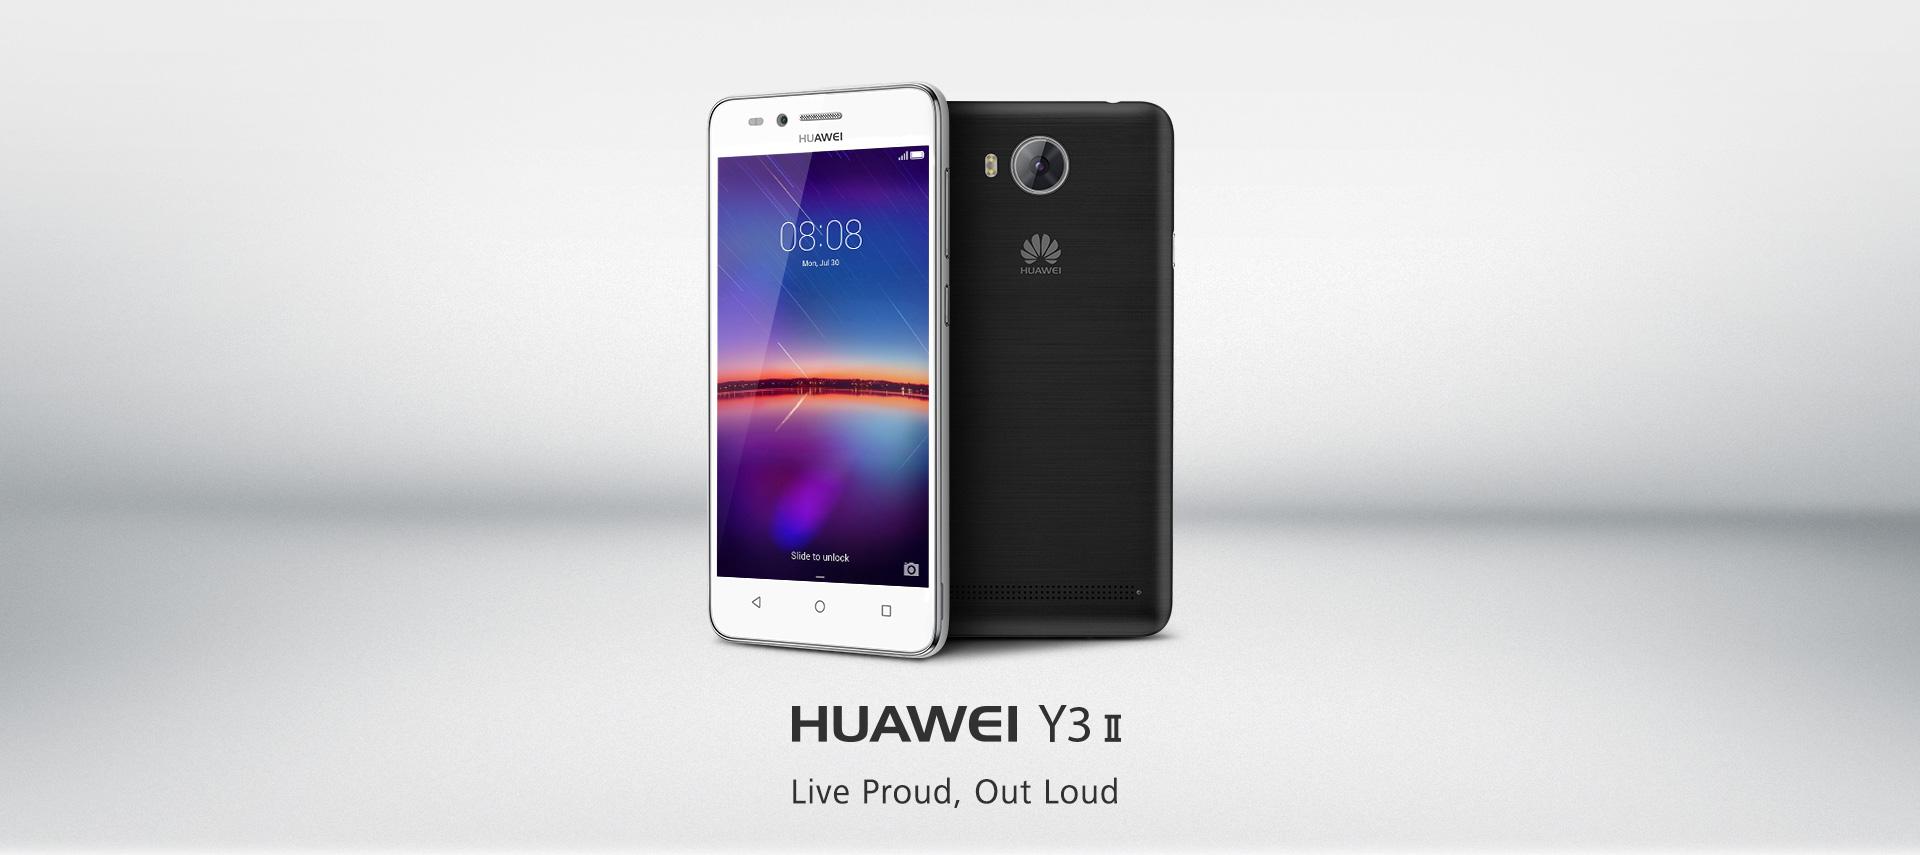 【Huawei HUAWEI Y3II Features 】